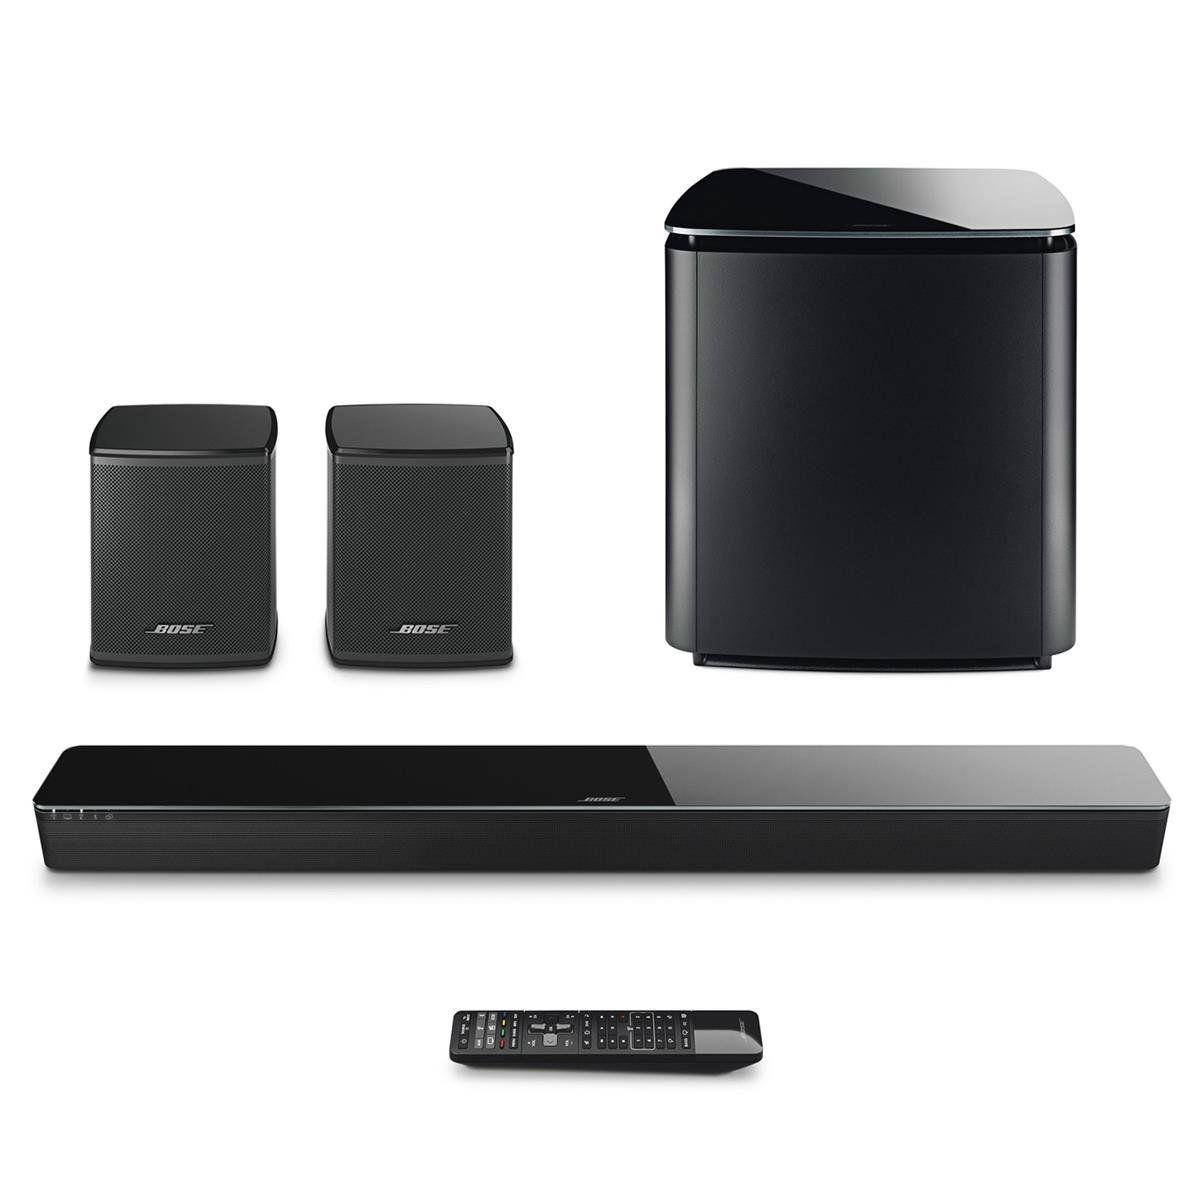 bose soundtouch 300 soundbar bundle with wireless acoustimass 300 bass module bose virtually. Black Bedroom Furniture Sets. Home Design Ideas